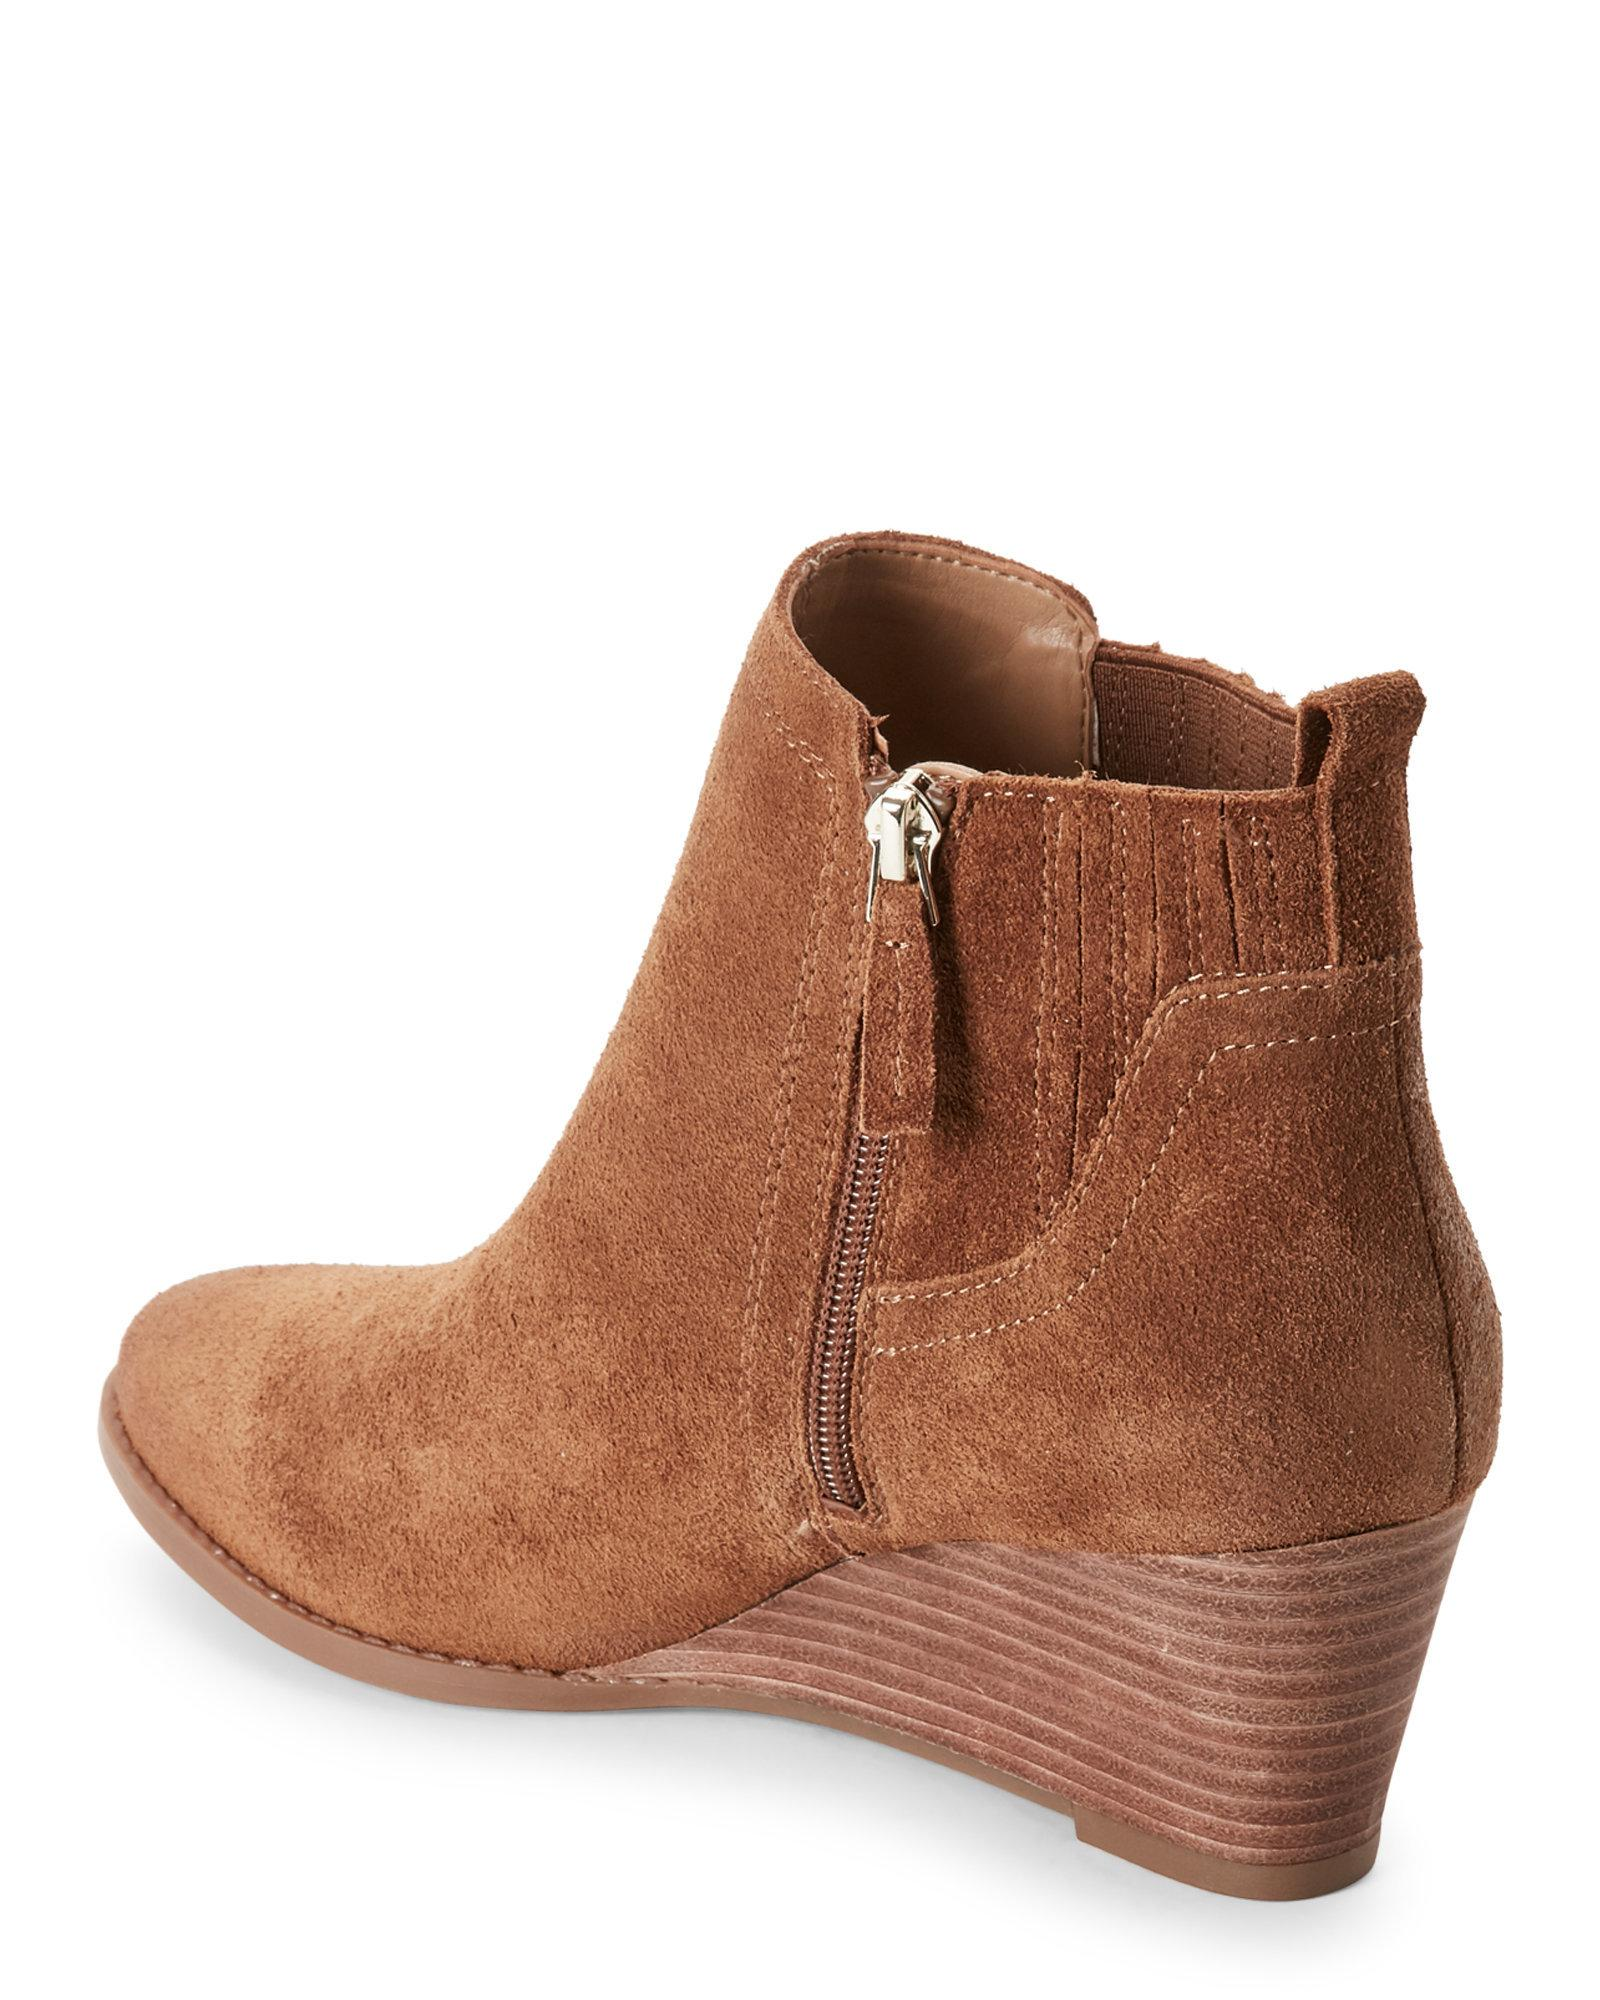 da8ad4104e0 Lyst - Franco Sarto Cognac Wayra Wedge Ankle Booties in Brown